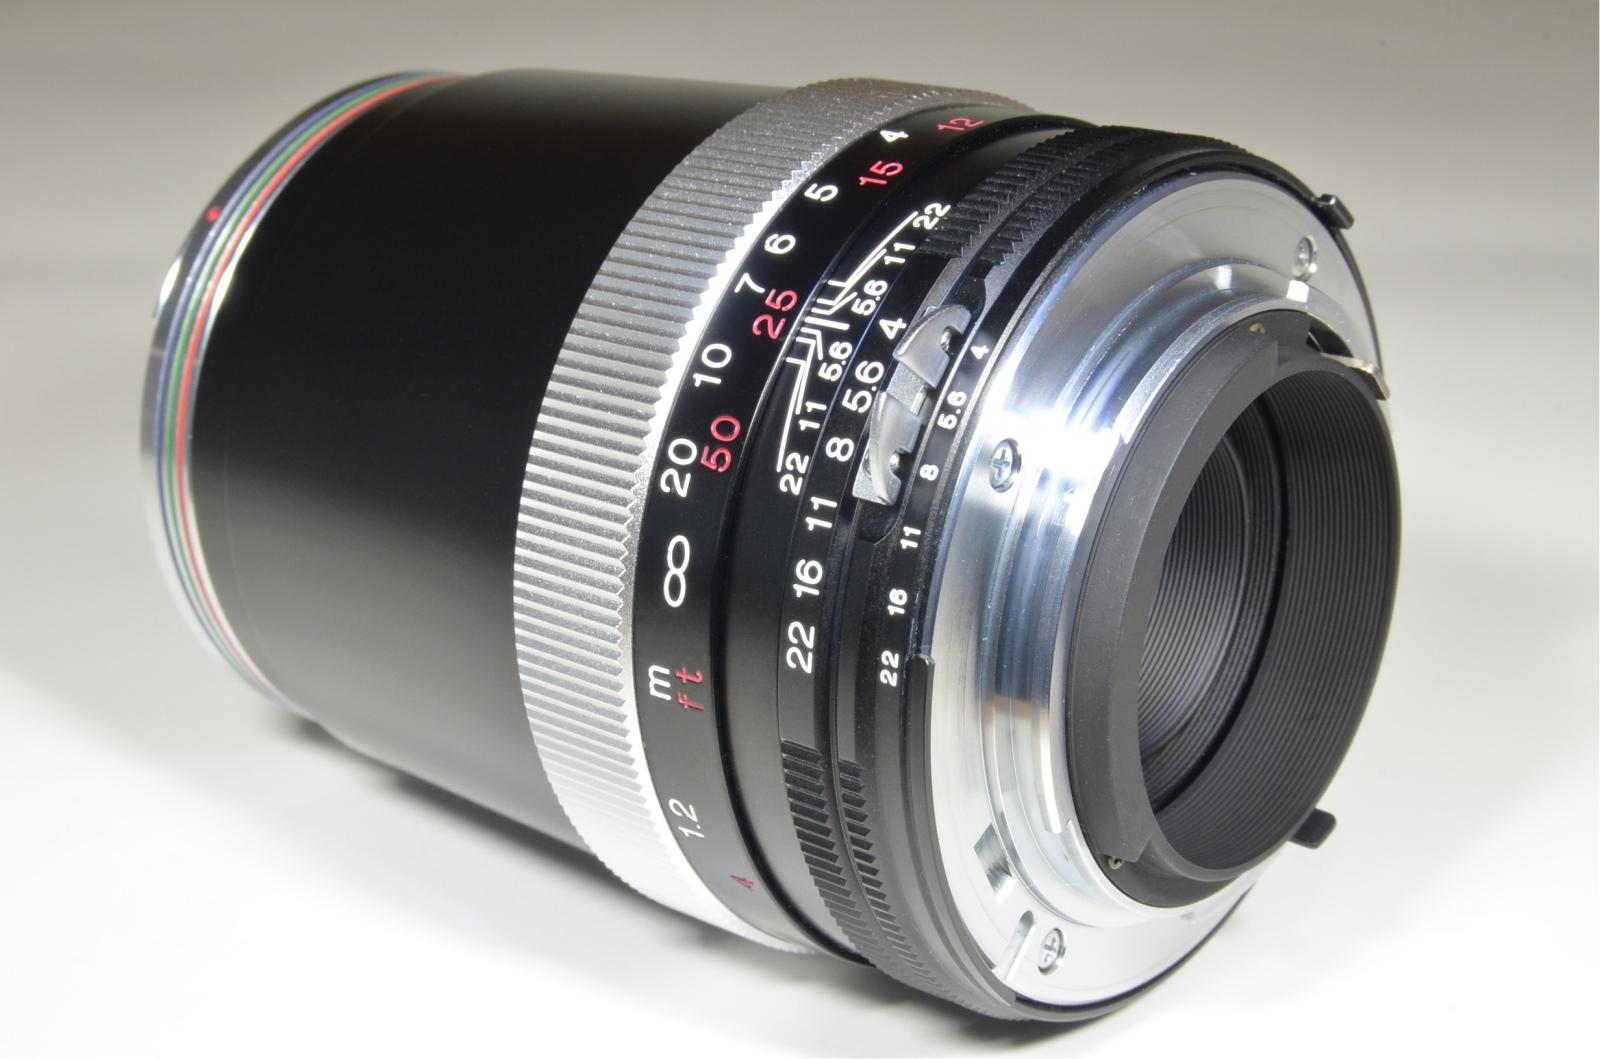 voigtlander apo-lanthar 180mm f4 sl for ai-s nikon with lens hood